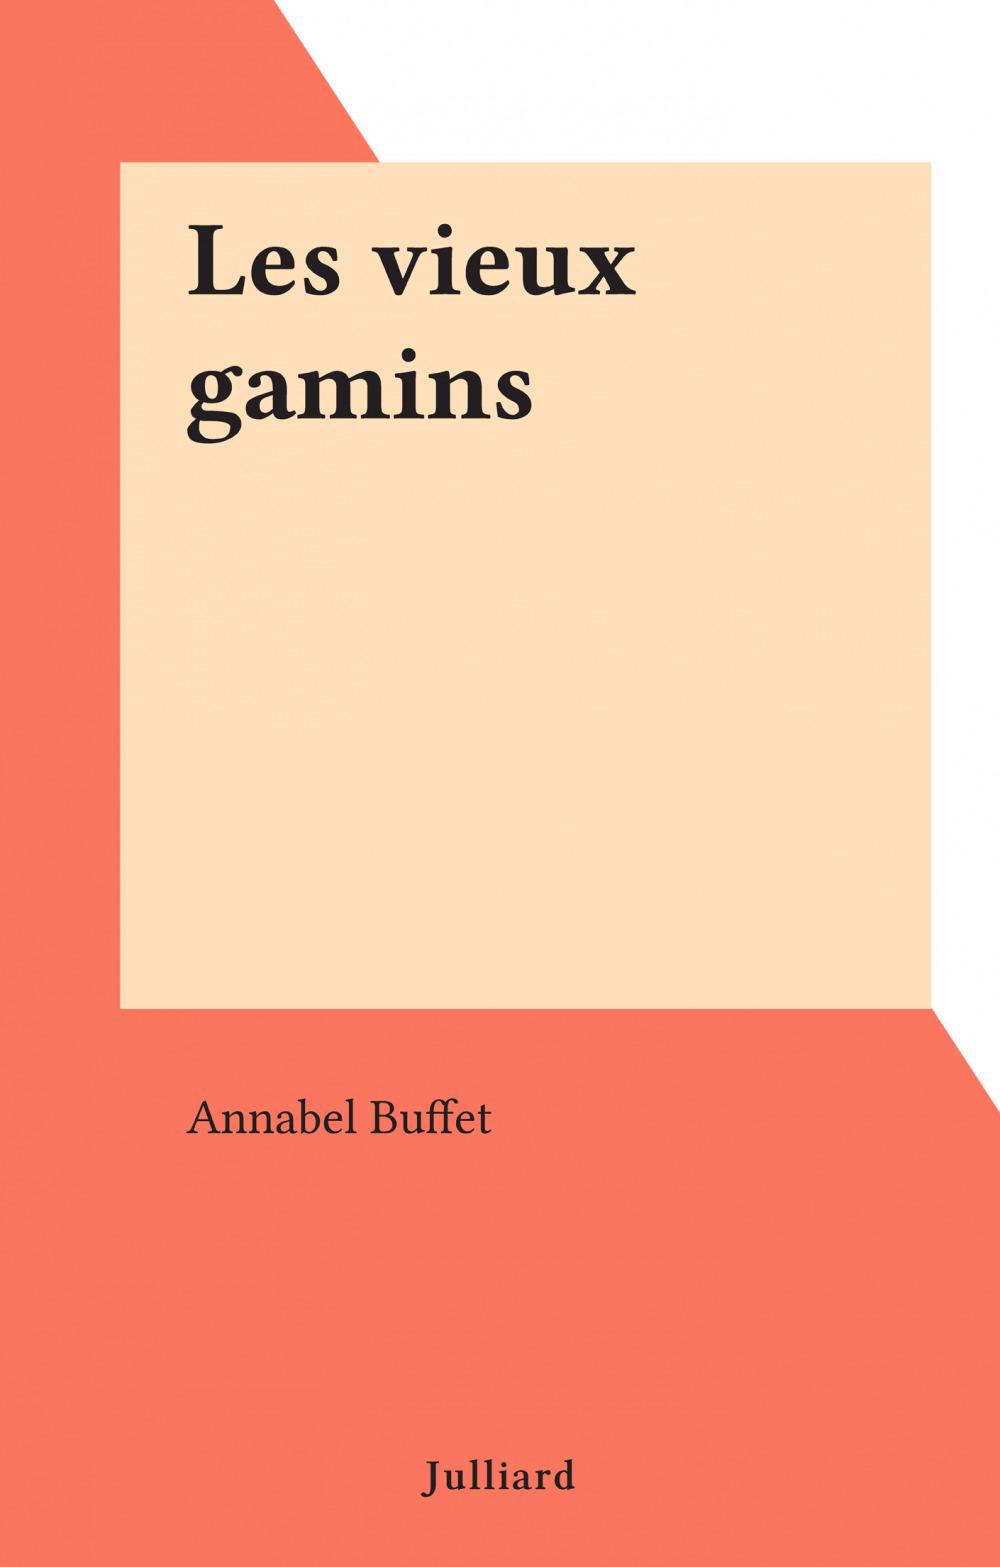 Les vieux gamins  - Annabel Buffet